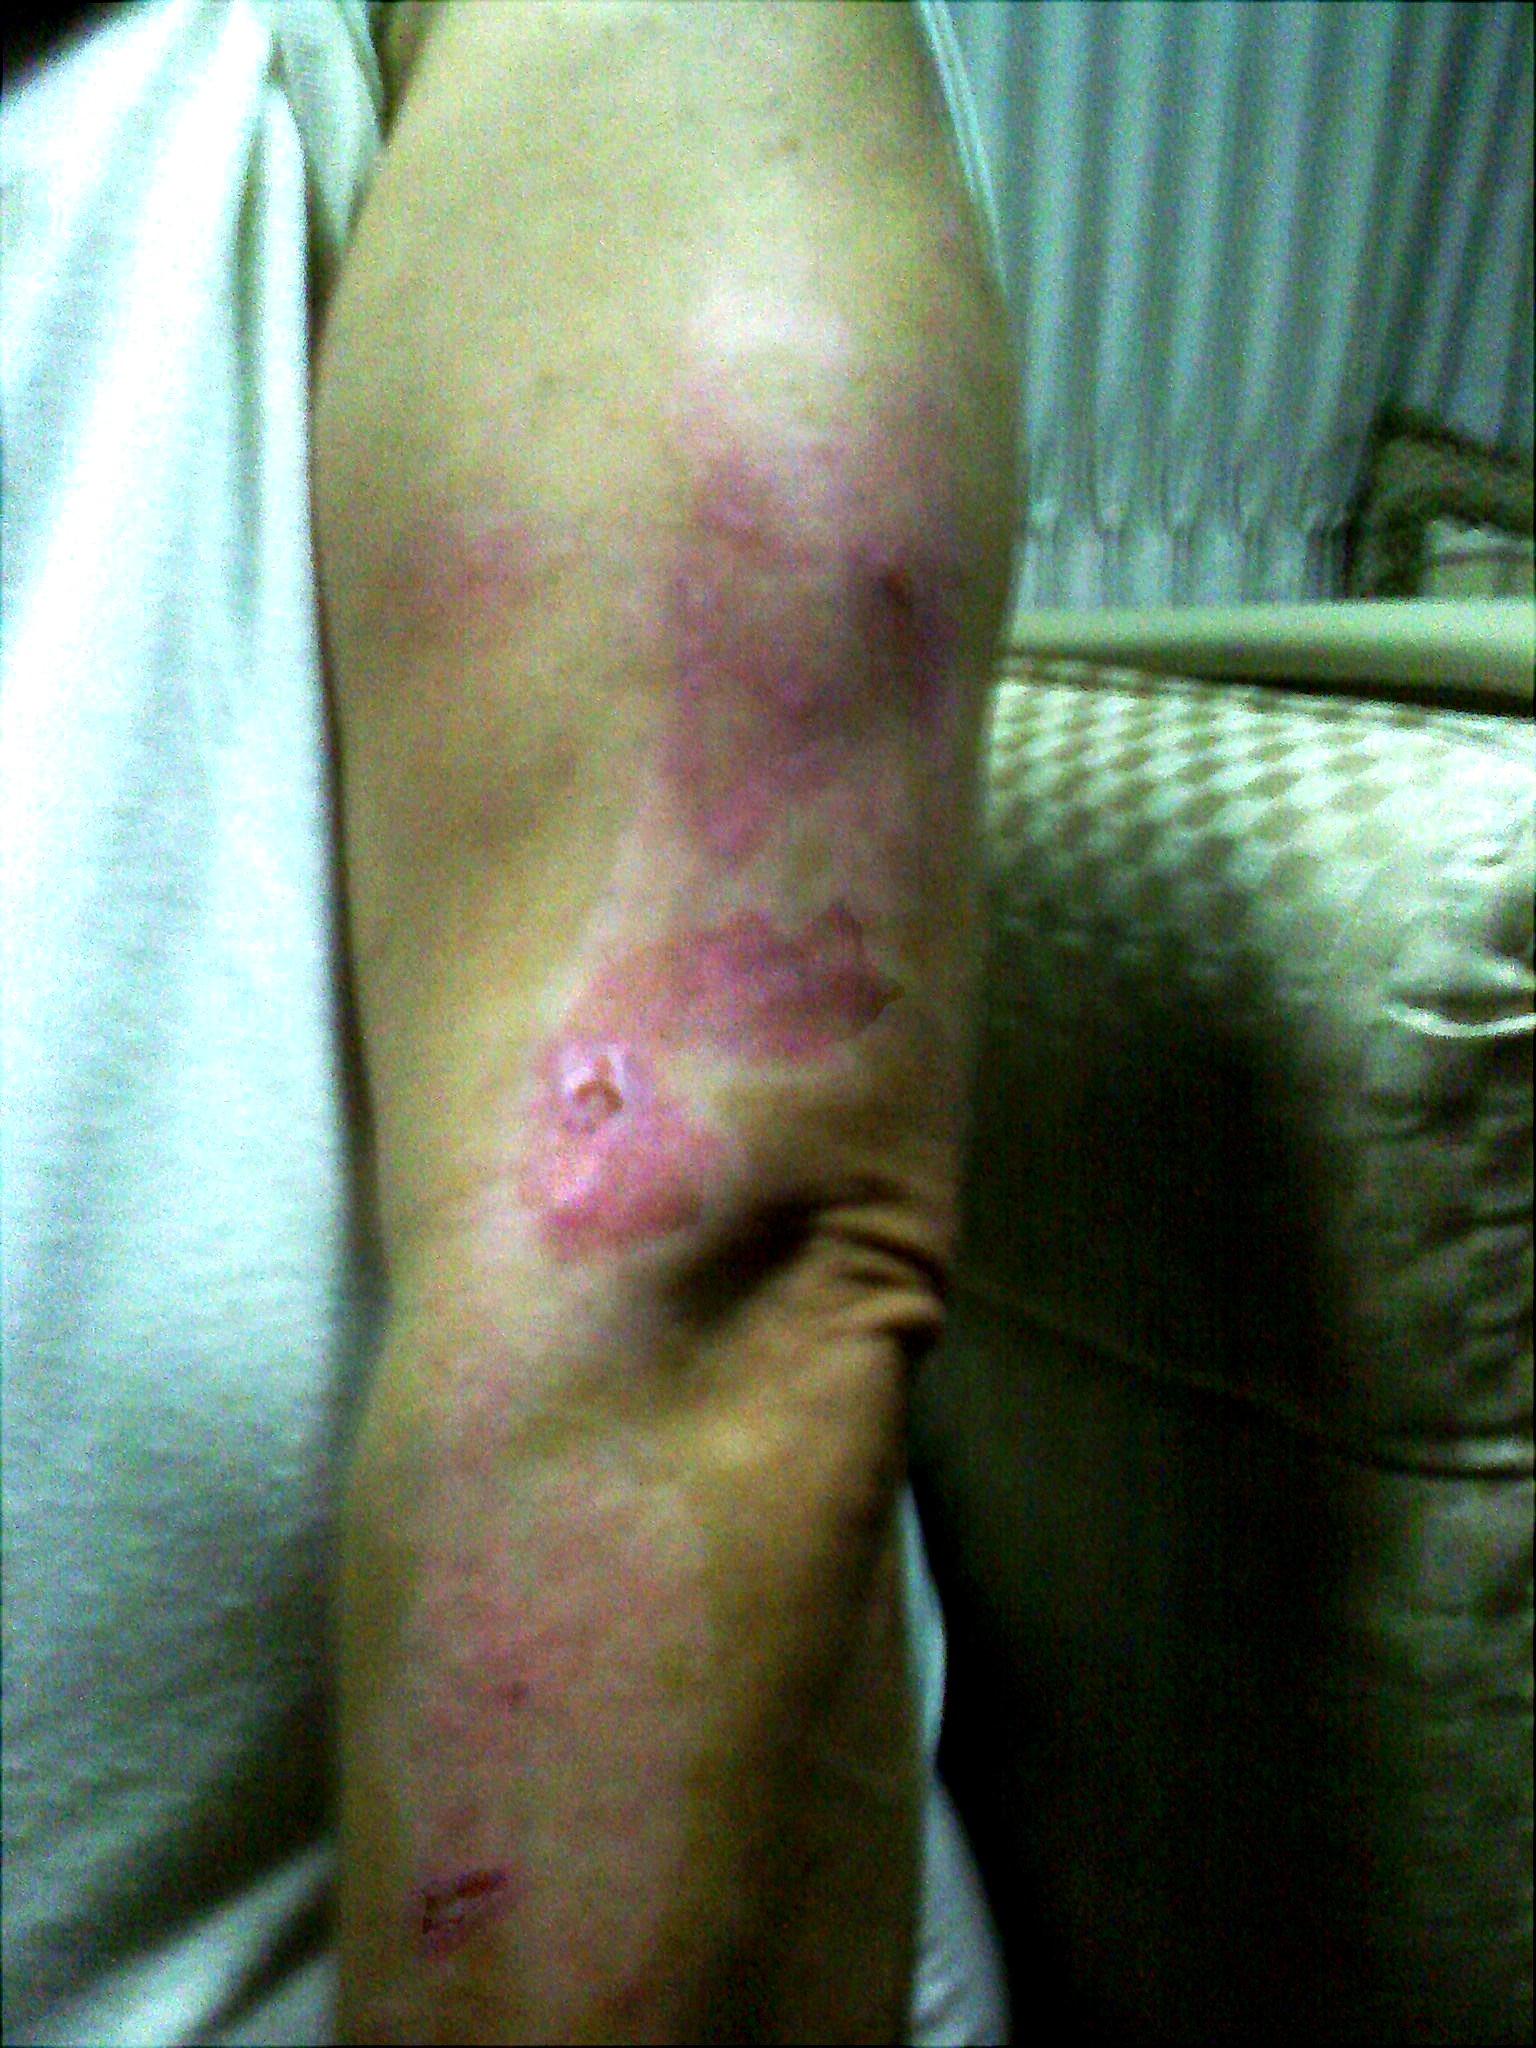     Upper arm burn